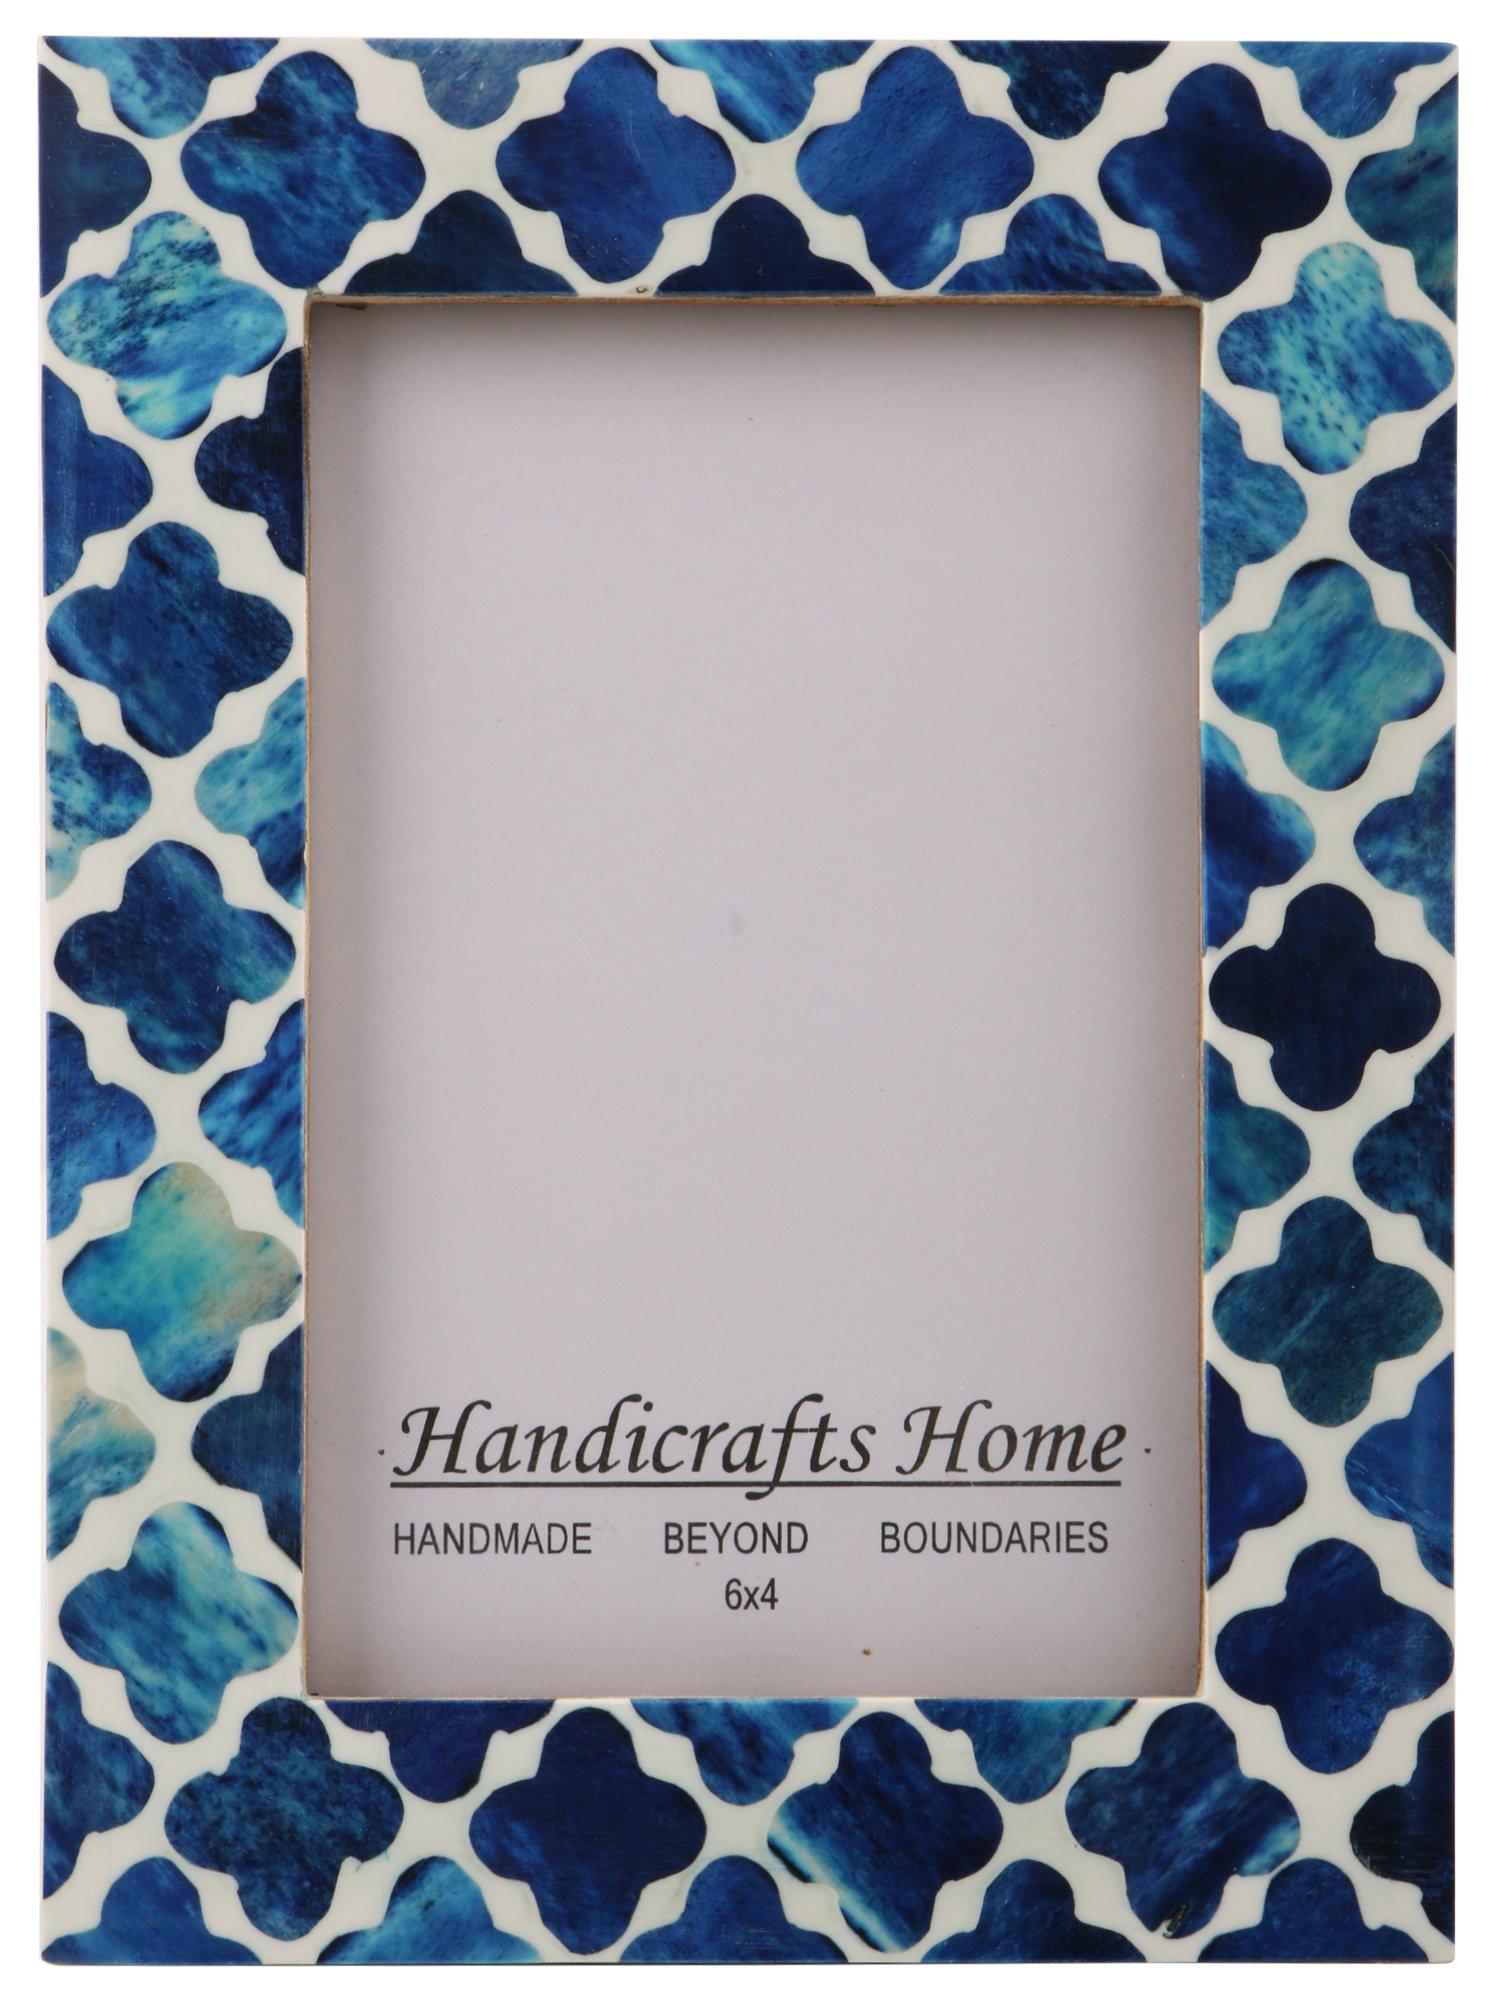 Handicrafts Home Picture Photo Frame Indigo Moorish Quatrefoil Handmade Naturals Bone Frames from Photo Size 4x6 (Indigo-2)